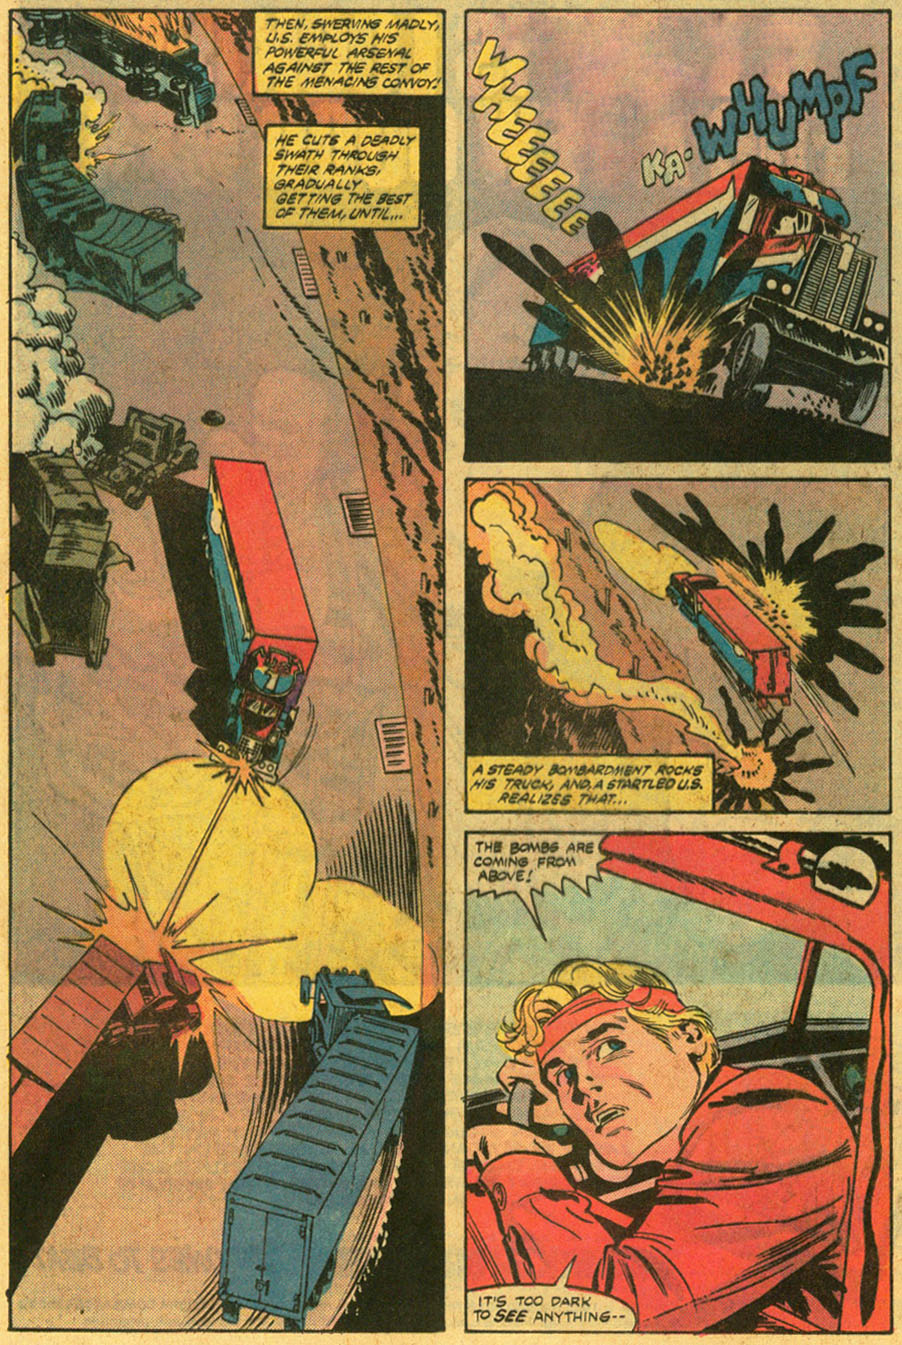 Read online U.S. 1 comic -  Issue #3 - 15